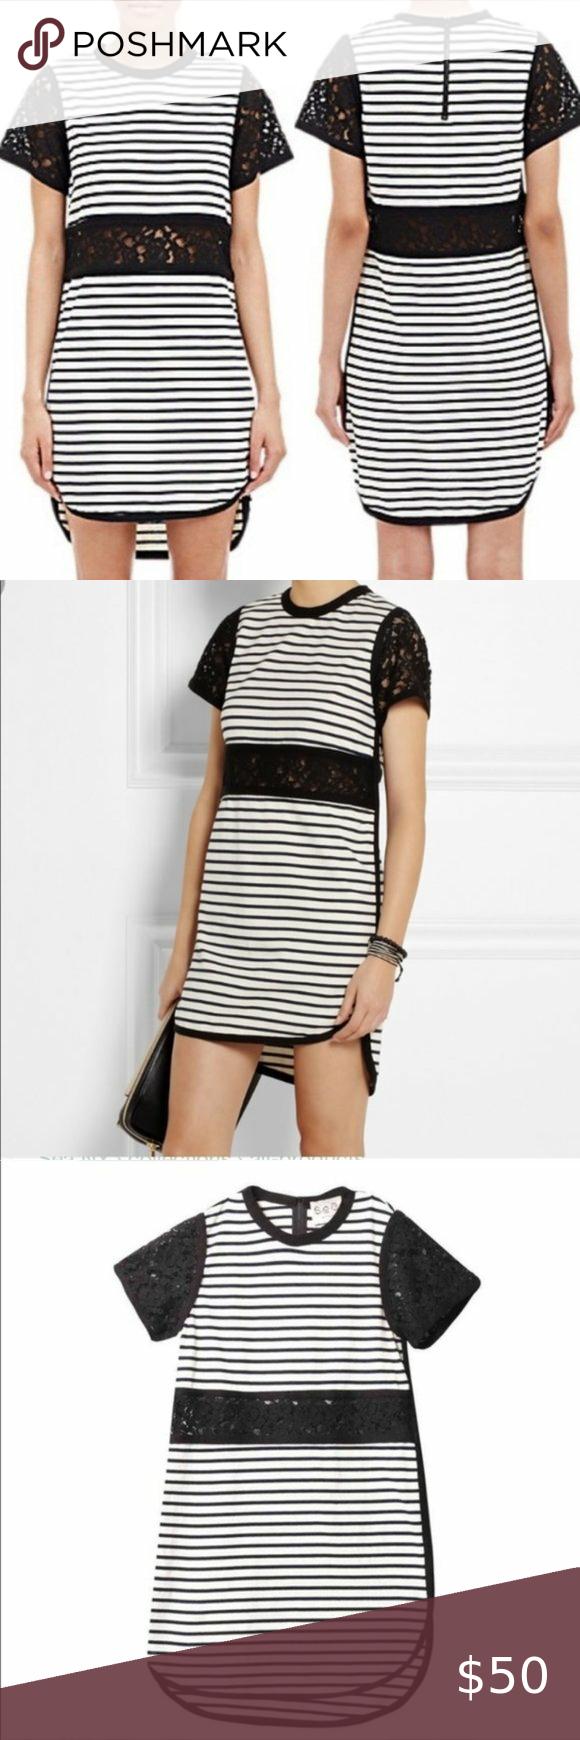 Sea Ny Breton Striped Cute Lace Cutout Knit Dress In 2020 Knit Dress Lace Cutout Striped Knit Dress [ 1740 x 580 Pixel ]